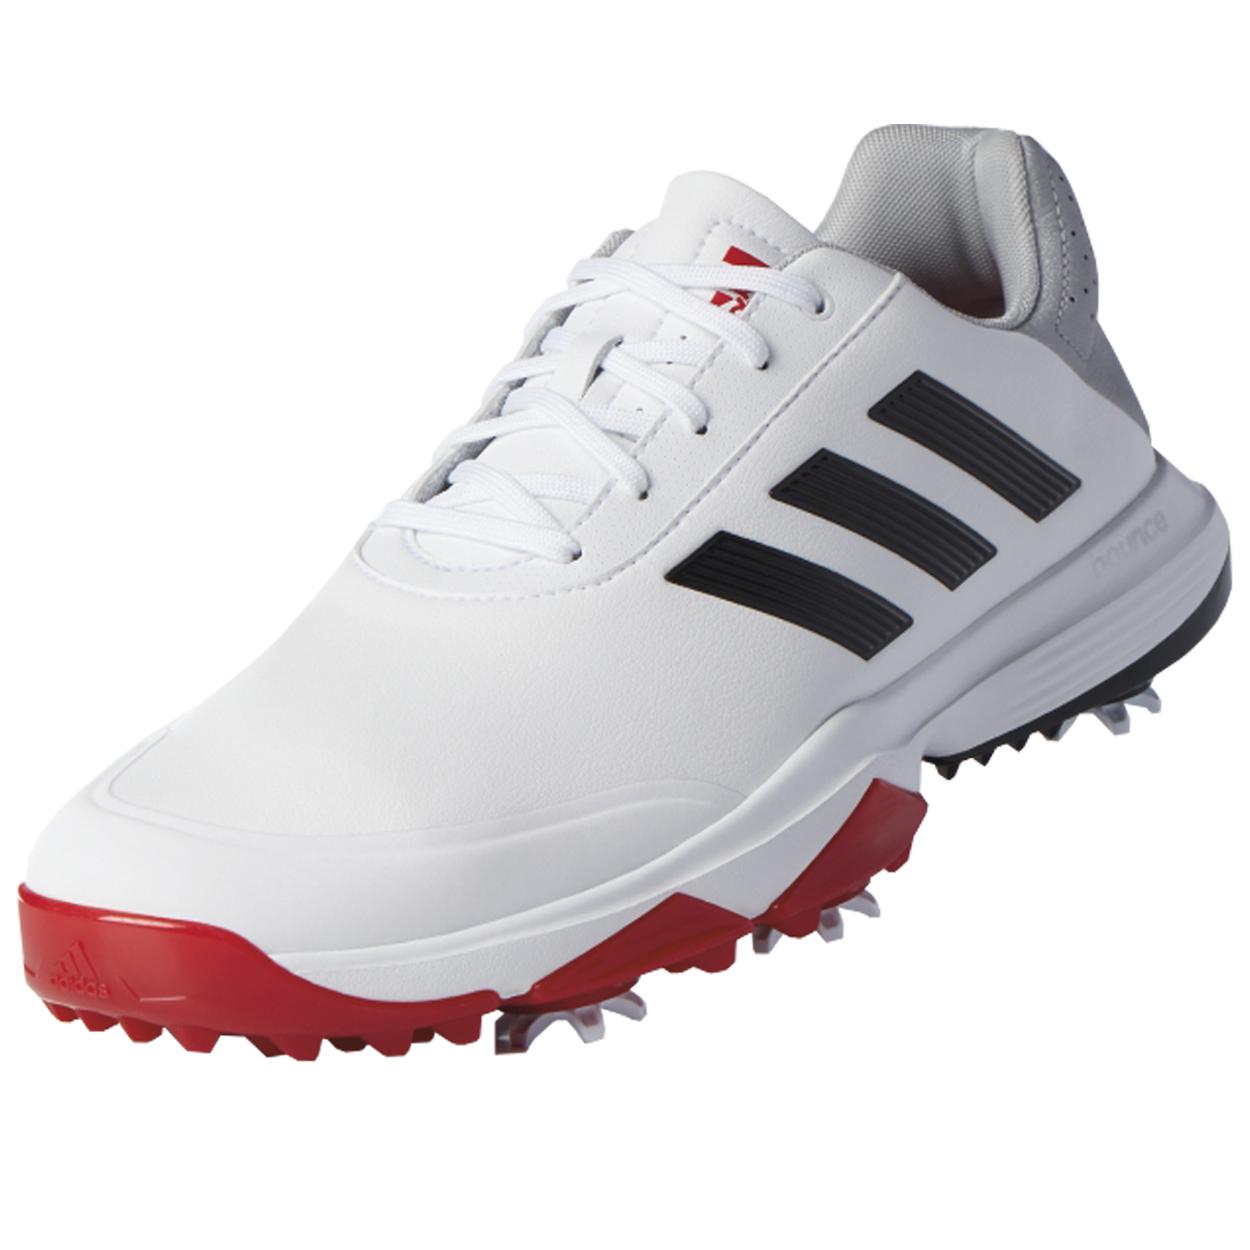 Adidas Men's adiPower...